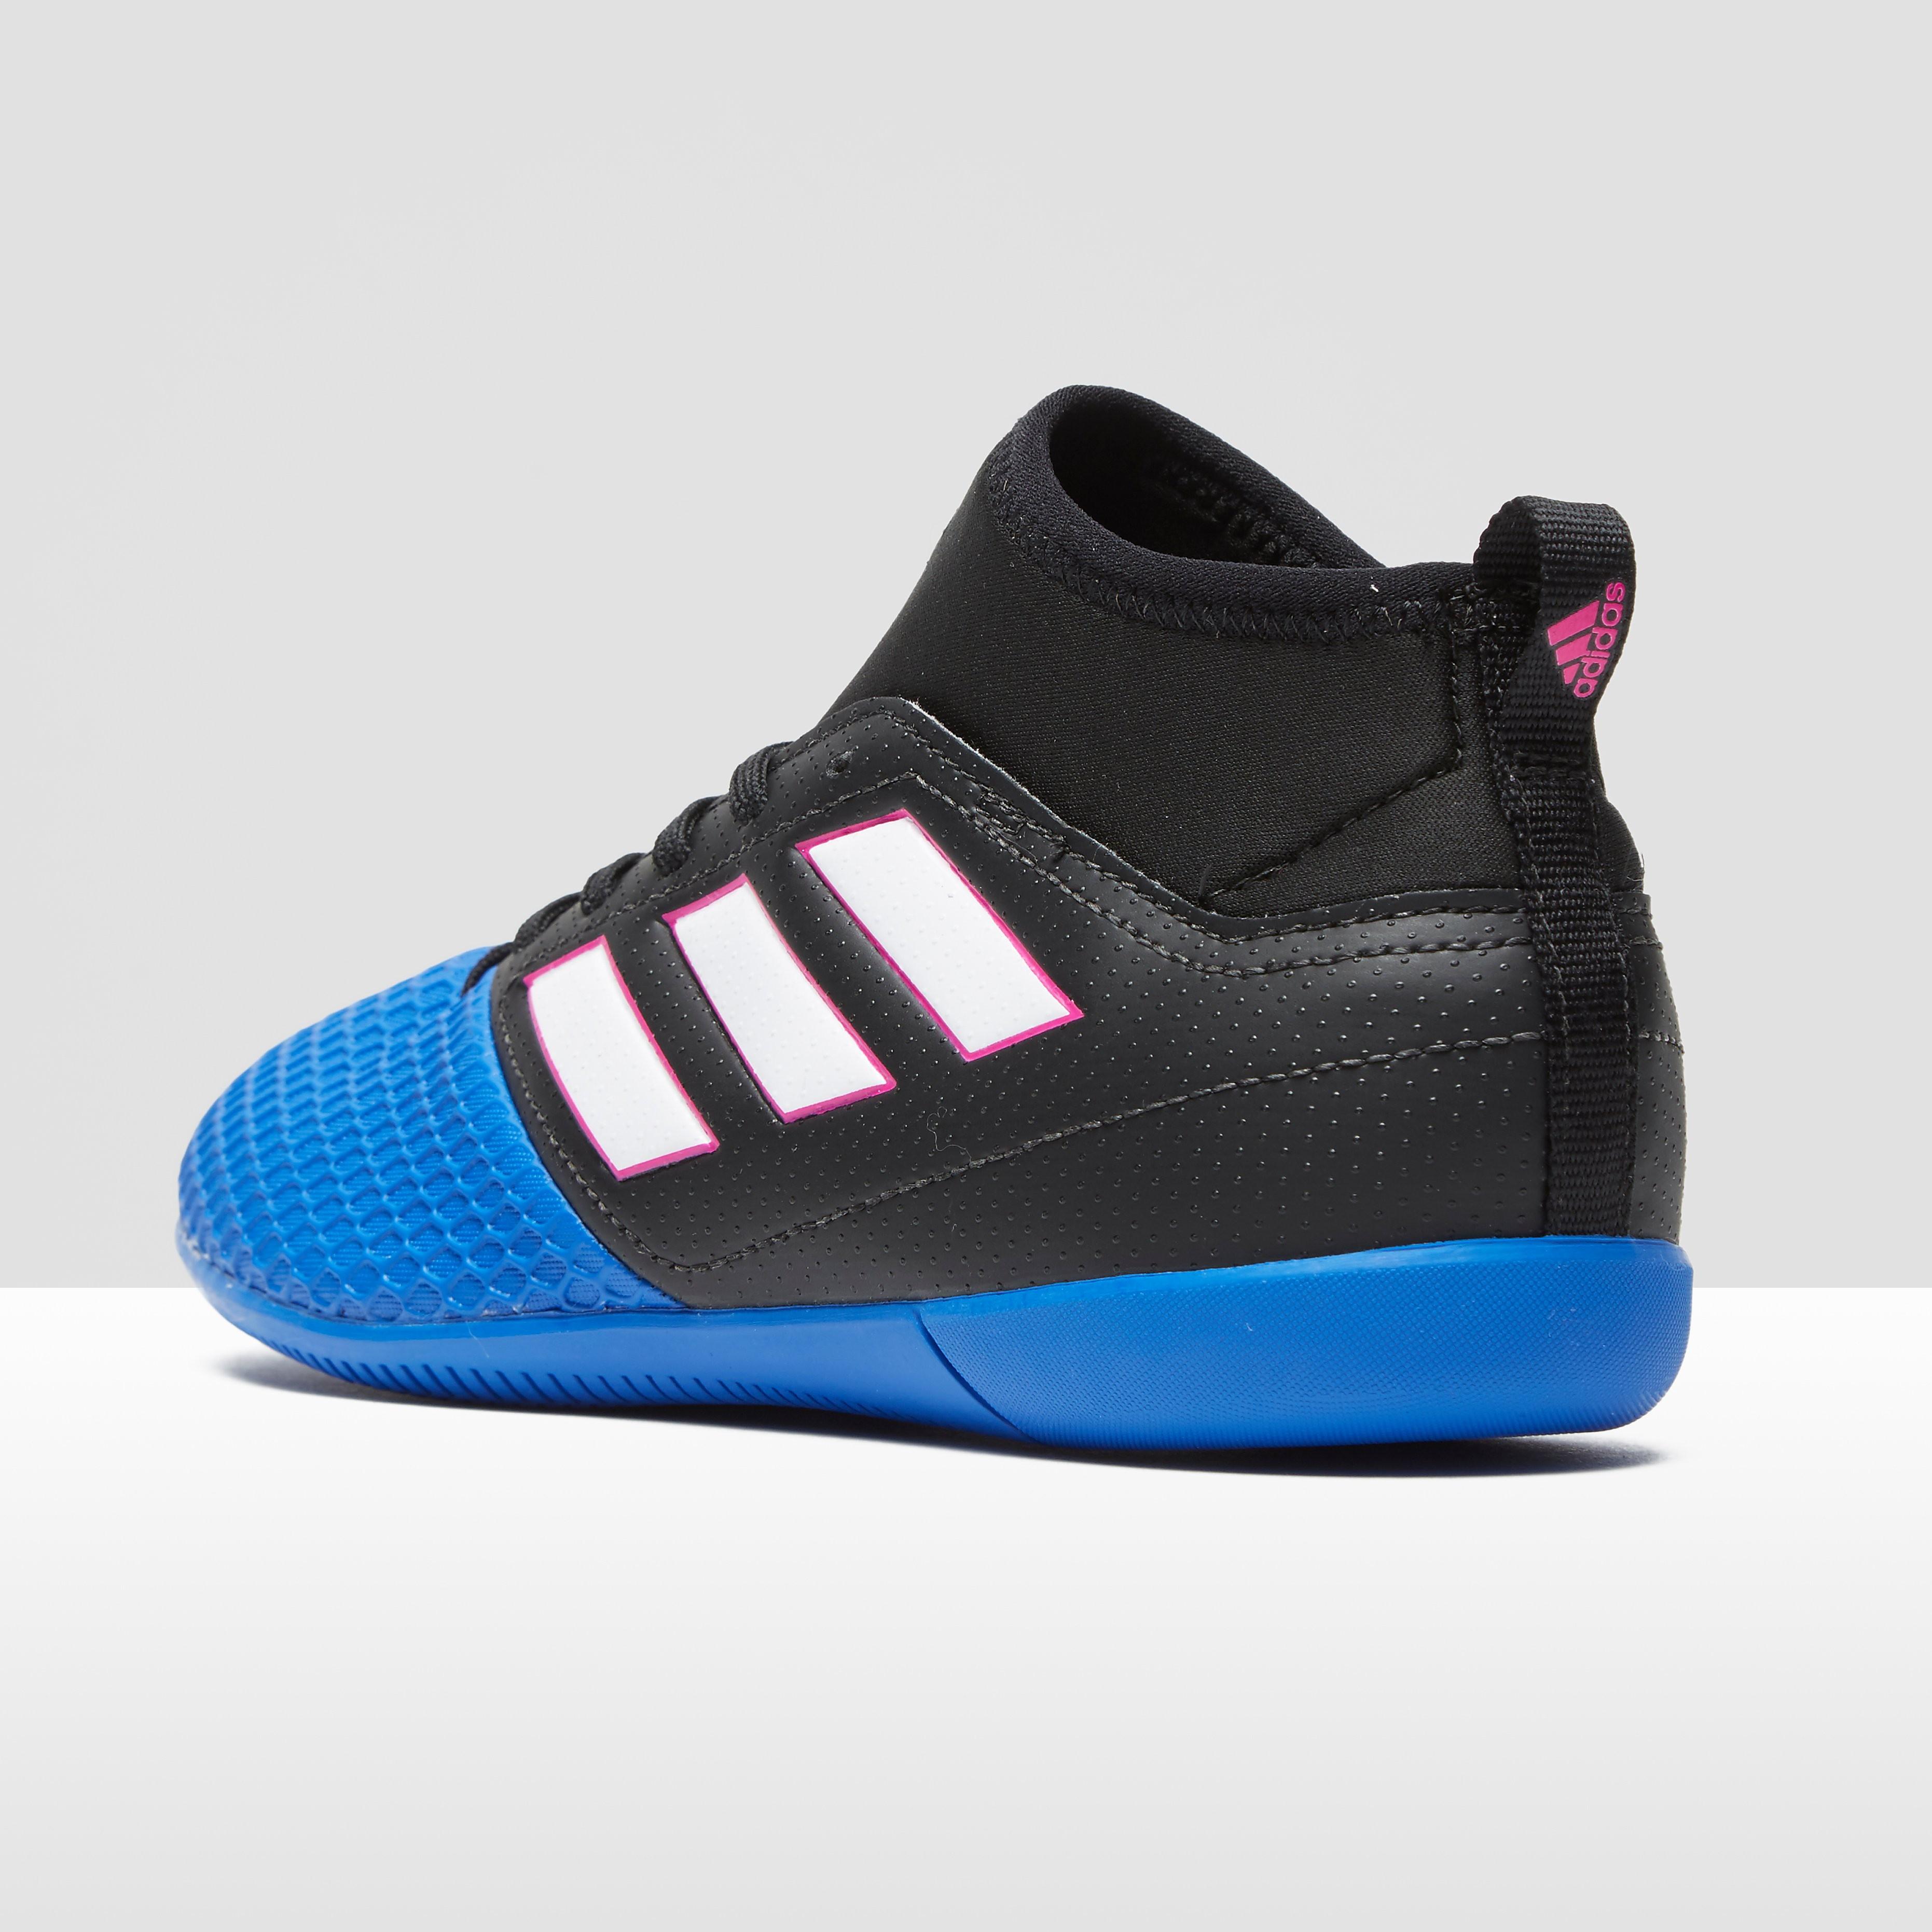 adidas Blue Blast Ace 17.3 Primemesh Junior Indoor Court Football Boots